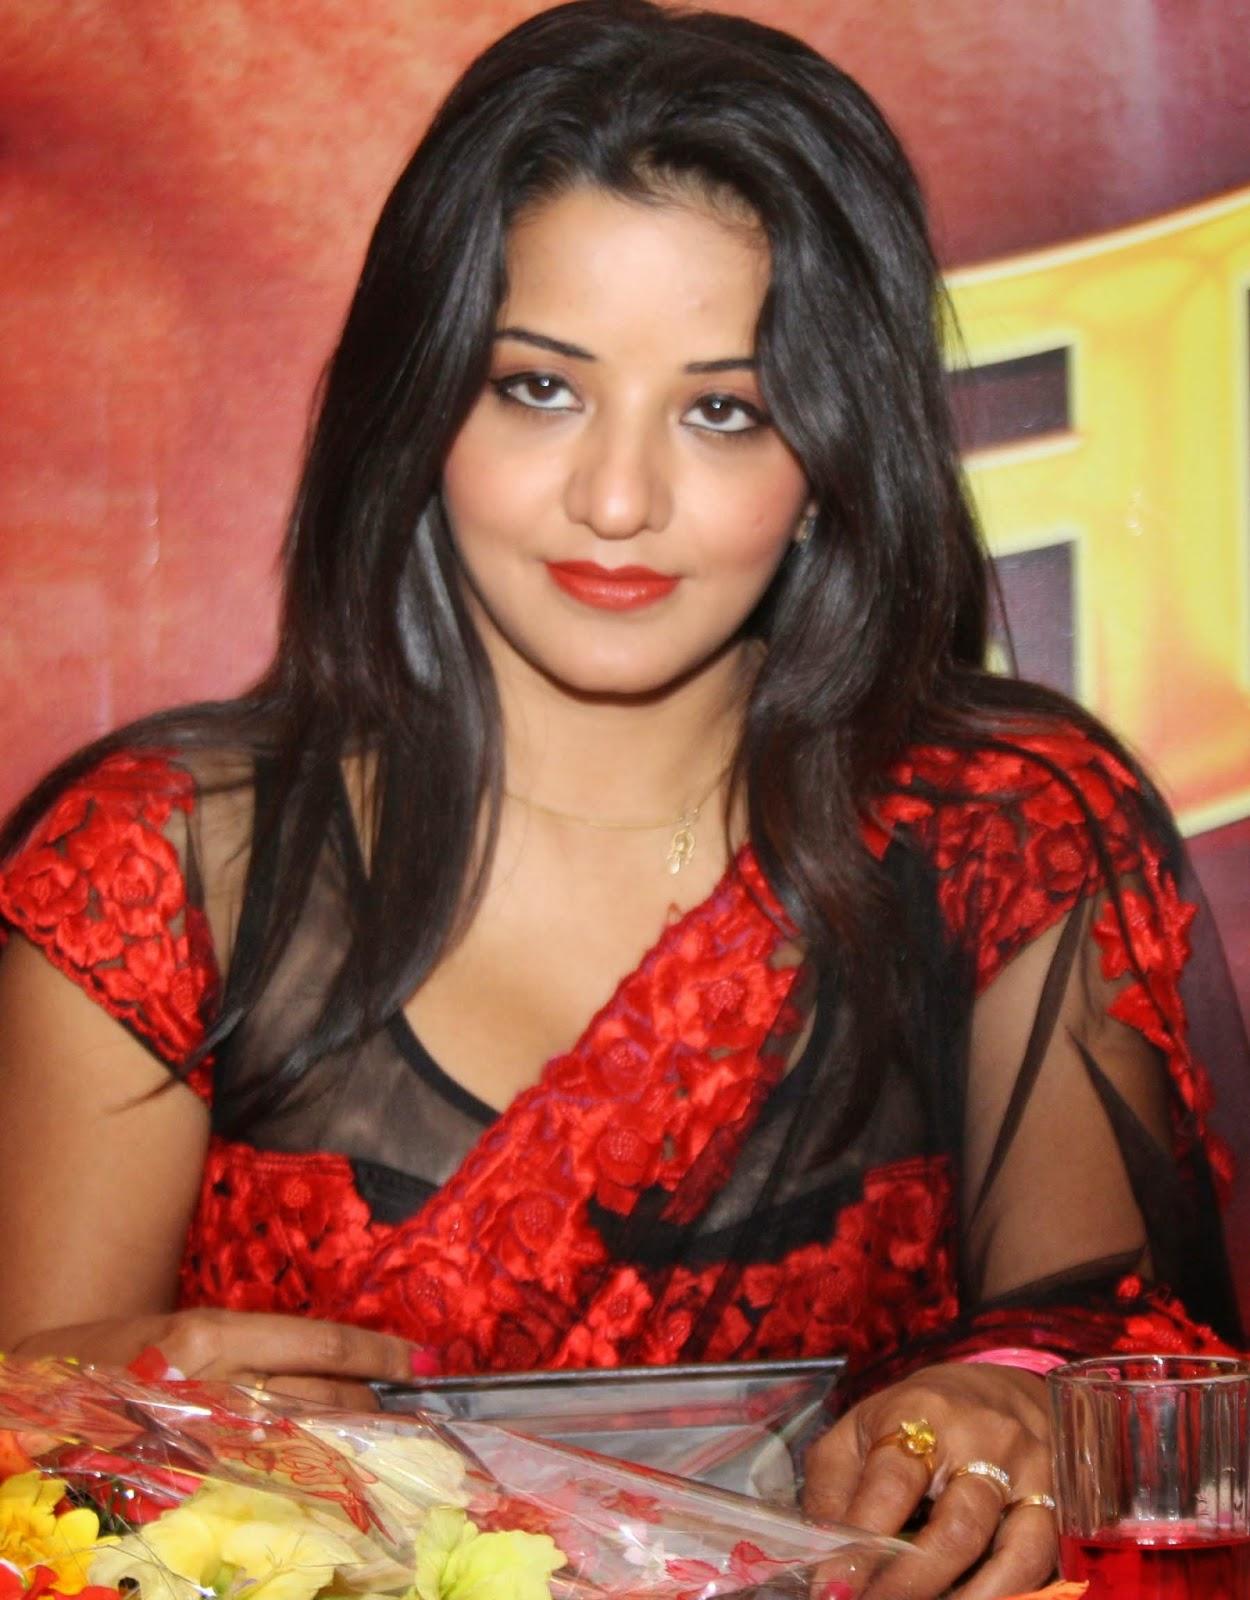 Bhojpuri Actress Monalisa mona lisa actress ,heroine bhojpuri films at ...